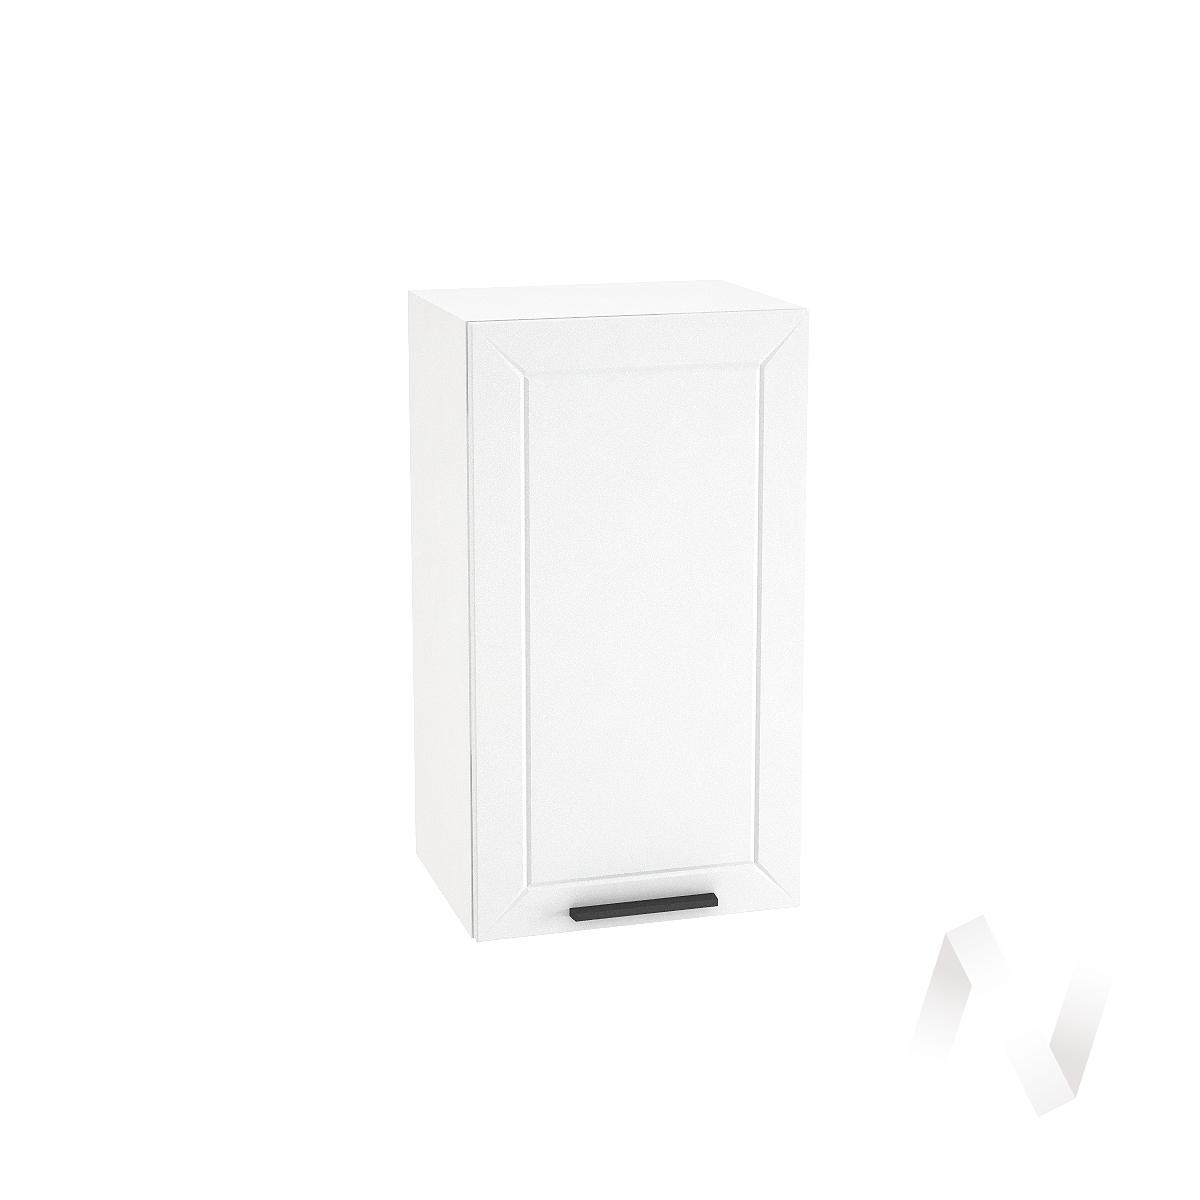 "Кухня ""Глетчер"": Шкаф верхний 400, ШВ 400 (Айленд Силк/корпус белый)"